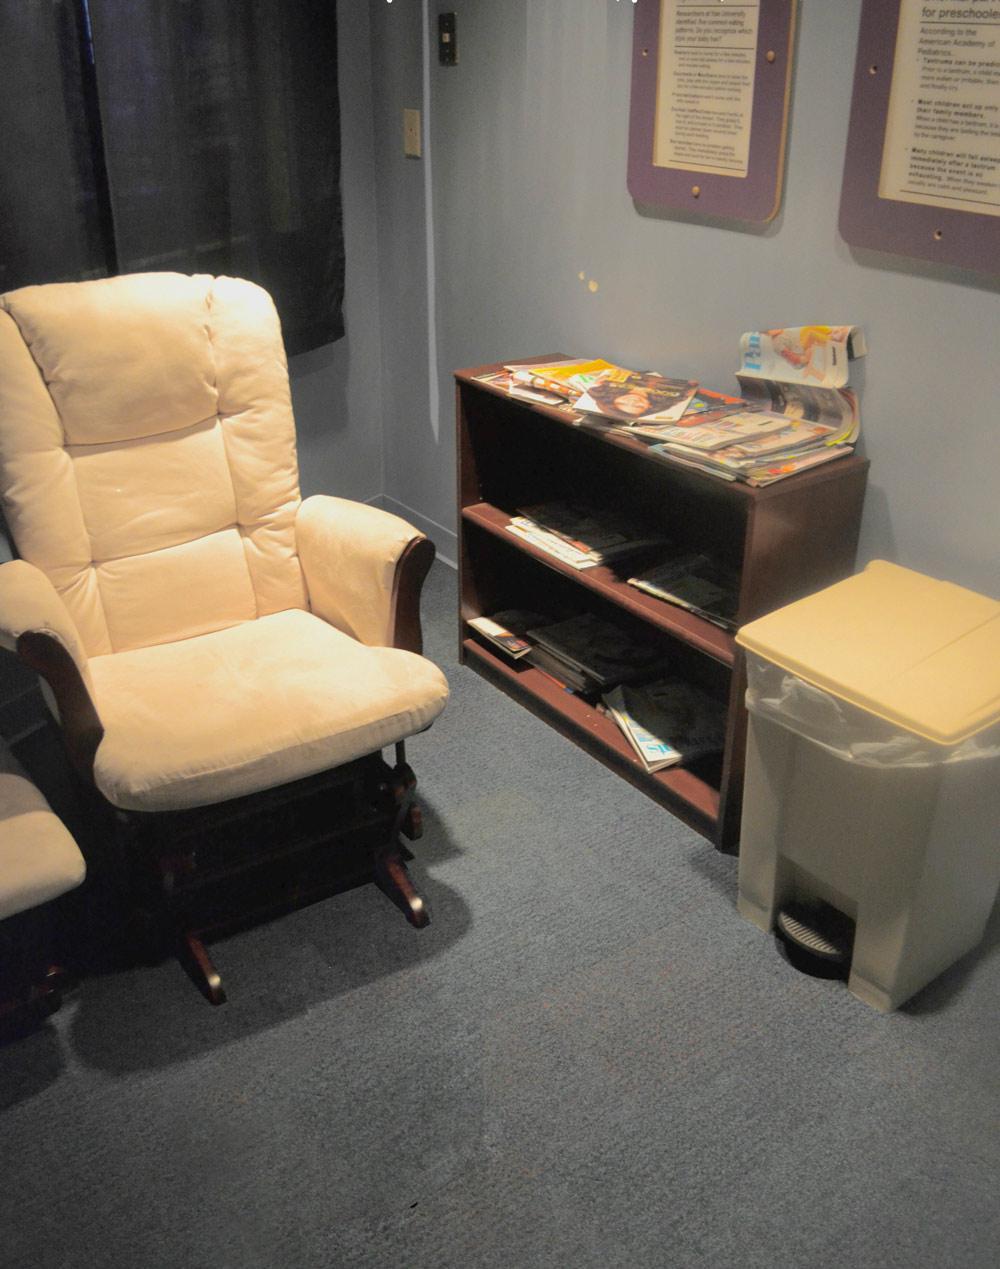 Imagination Station Toledo Ohio - nursing mothers room